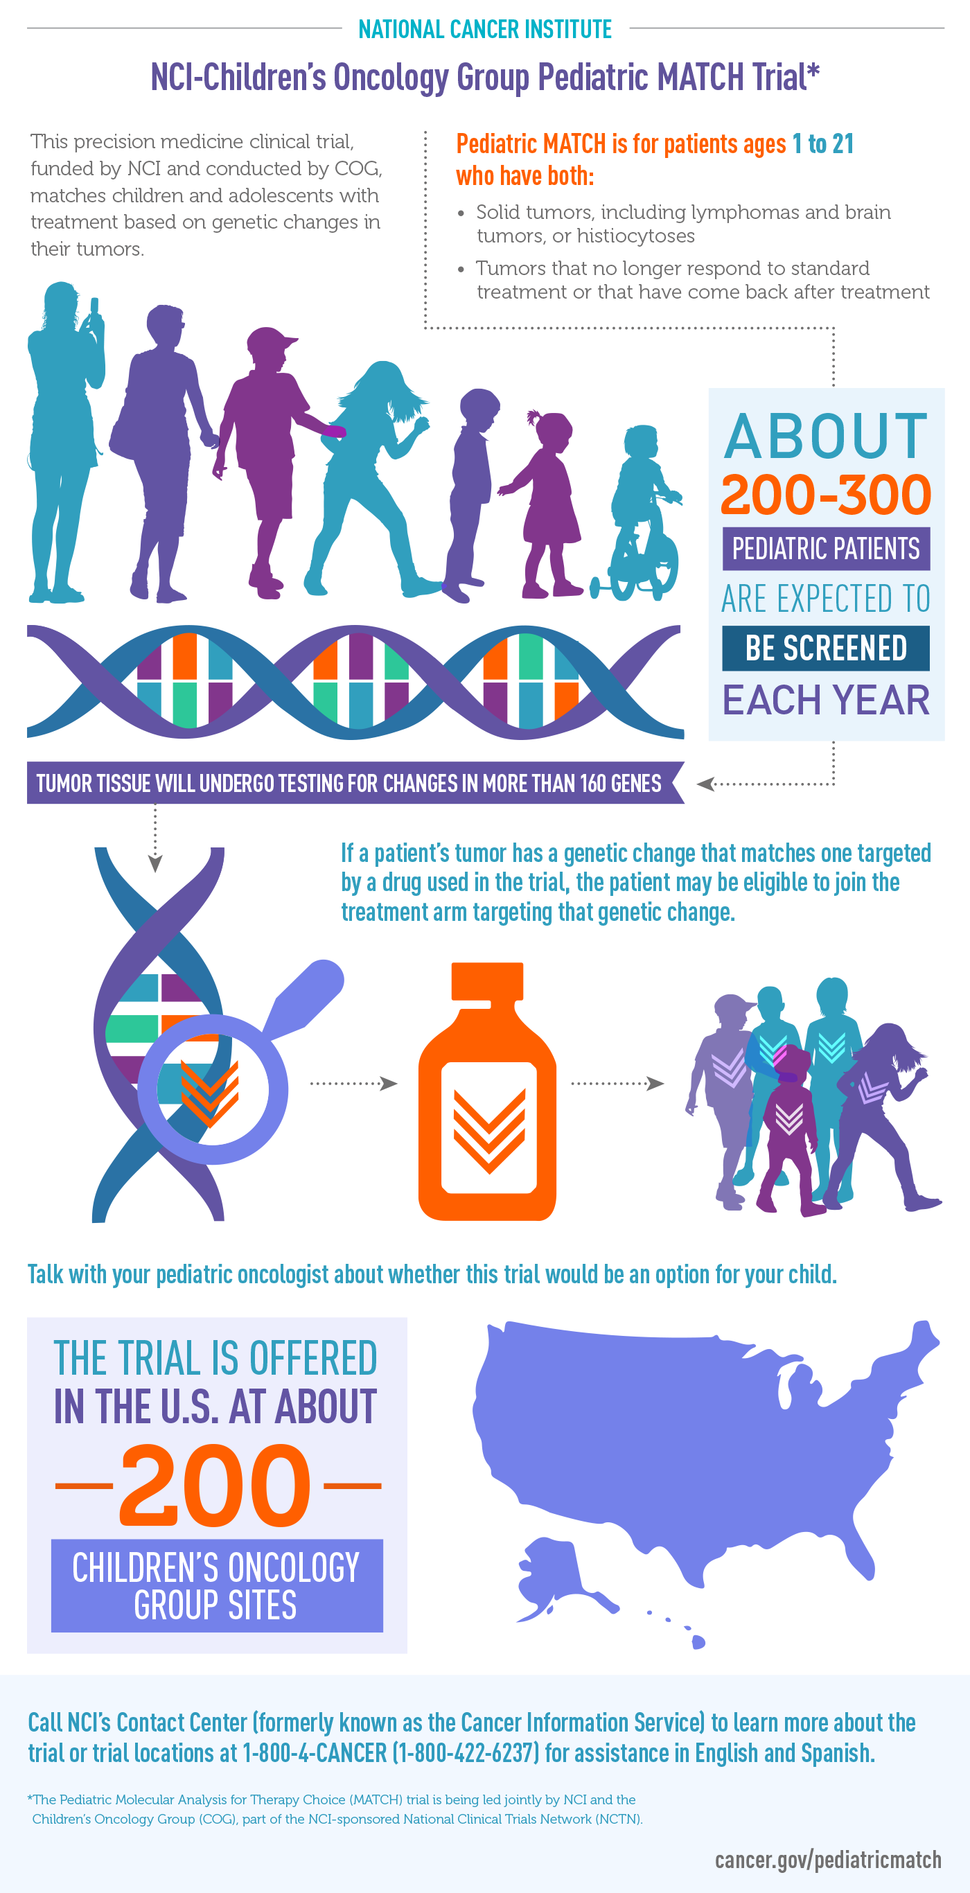 Pediatric MATCH Infographic - National Cancer Institute